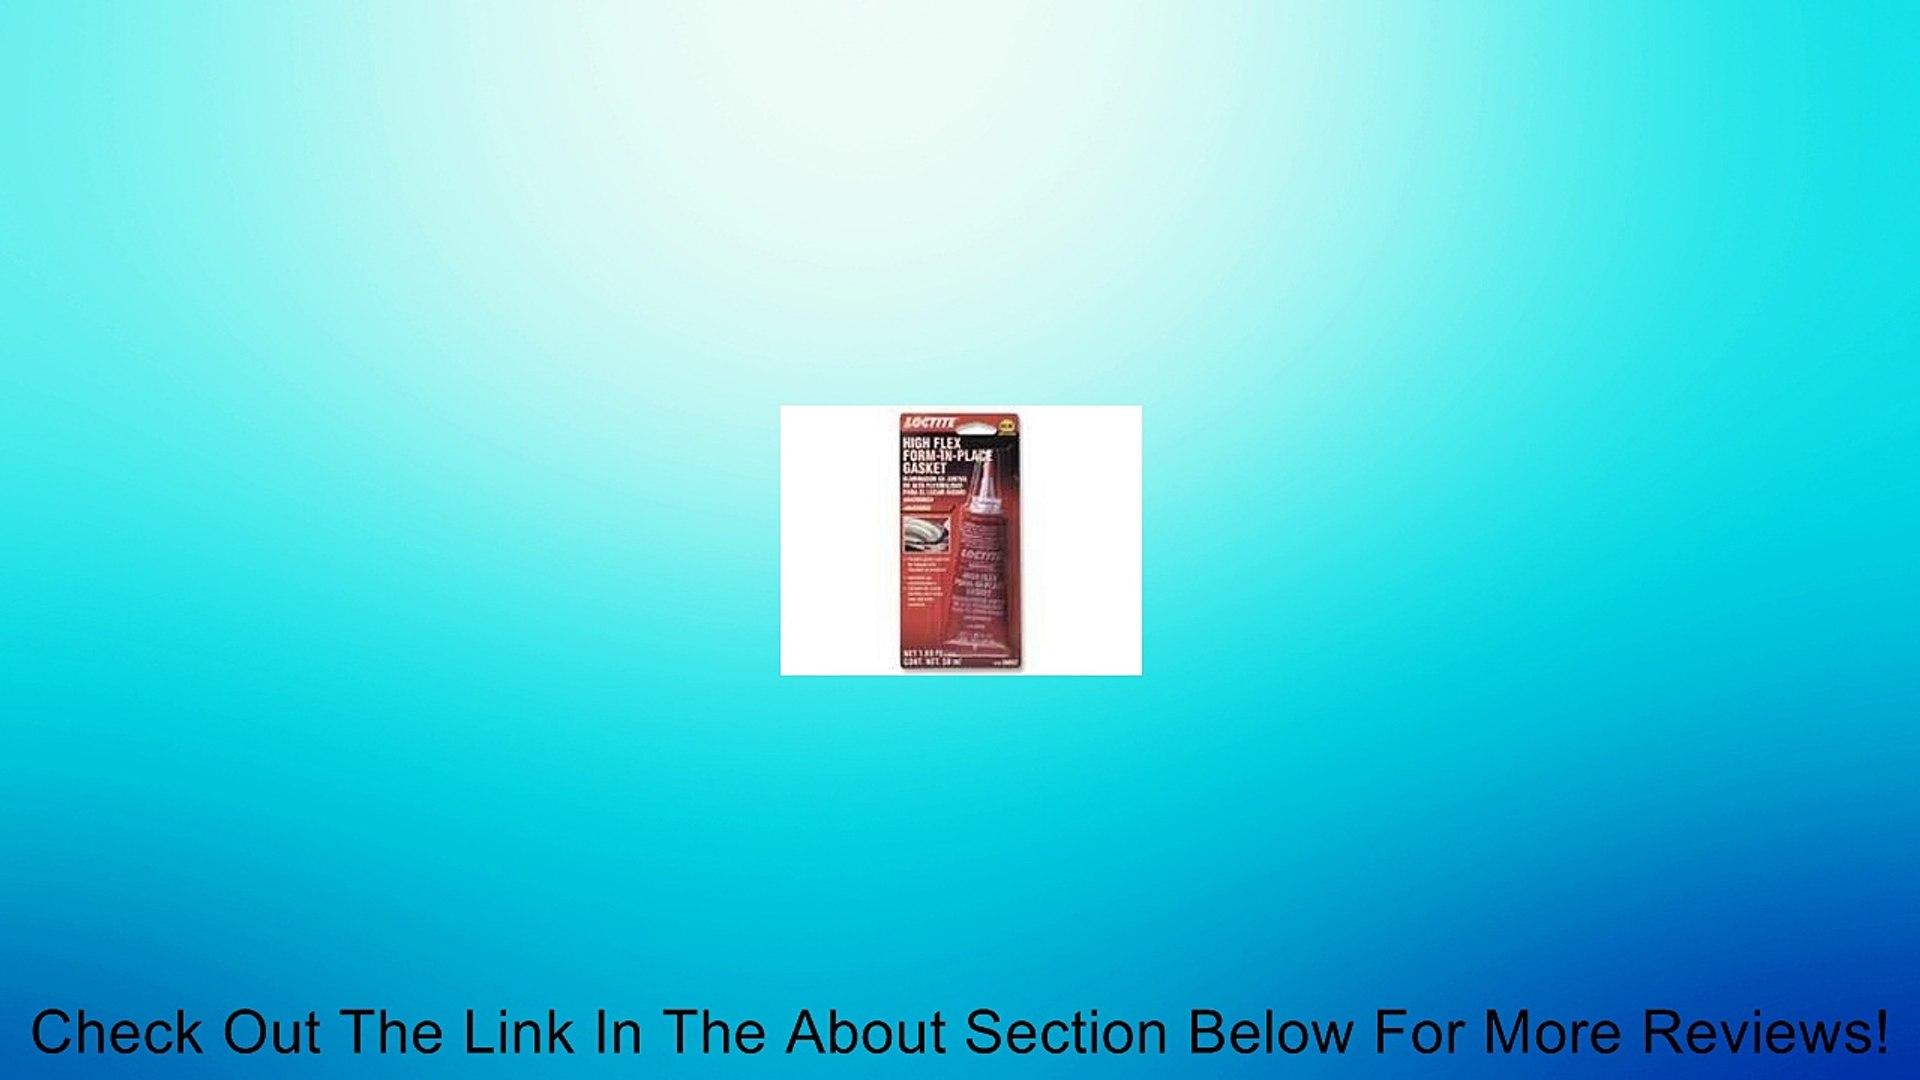 Loctite 38657 High Flex Gasket Maker - 1 69 oz  Review